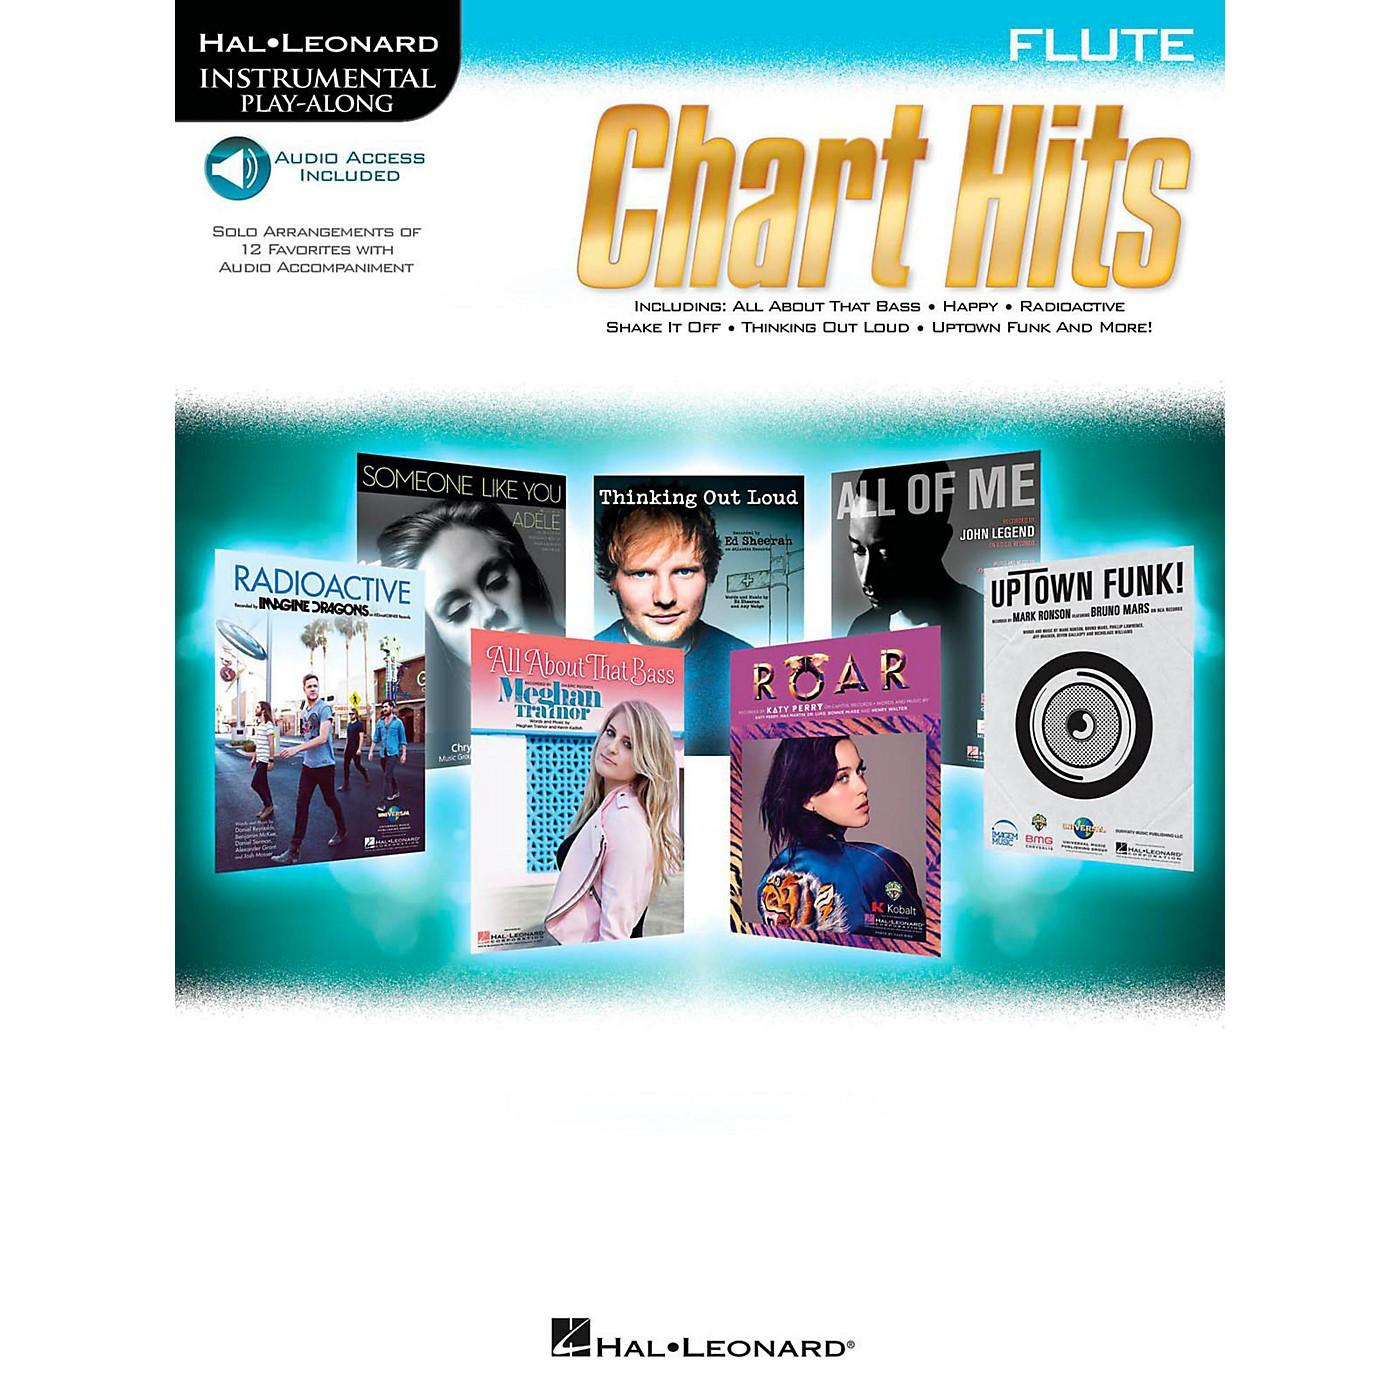 Hal Leonard Chart Hits For Flute - Instrumental Play-Along (Book/Online Audio) thumbnail